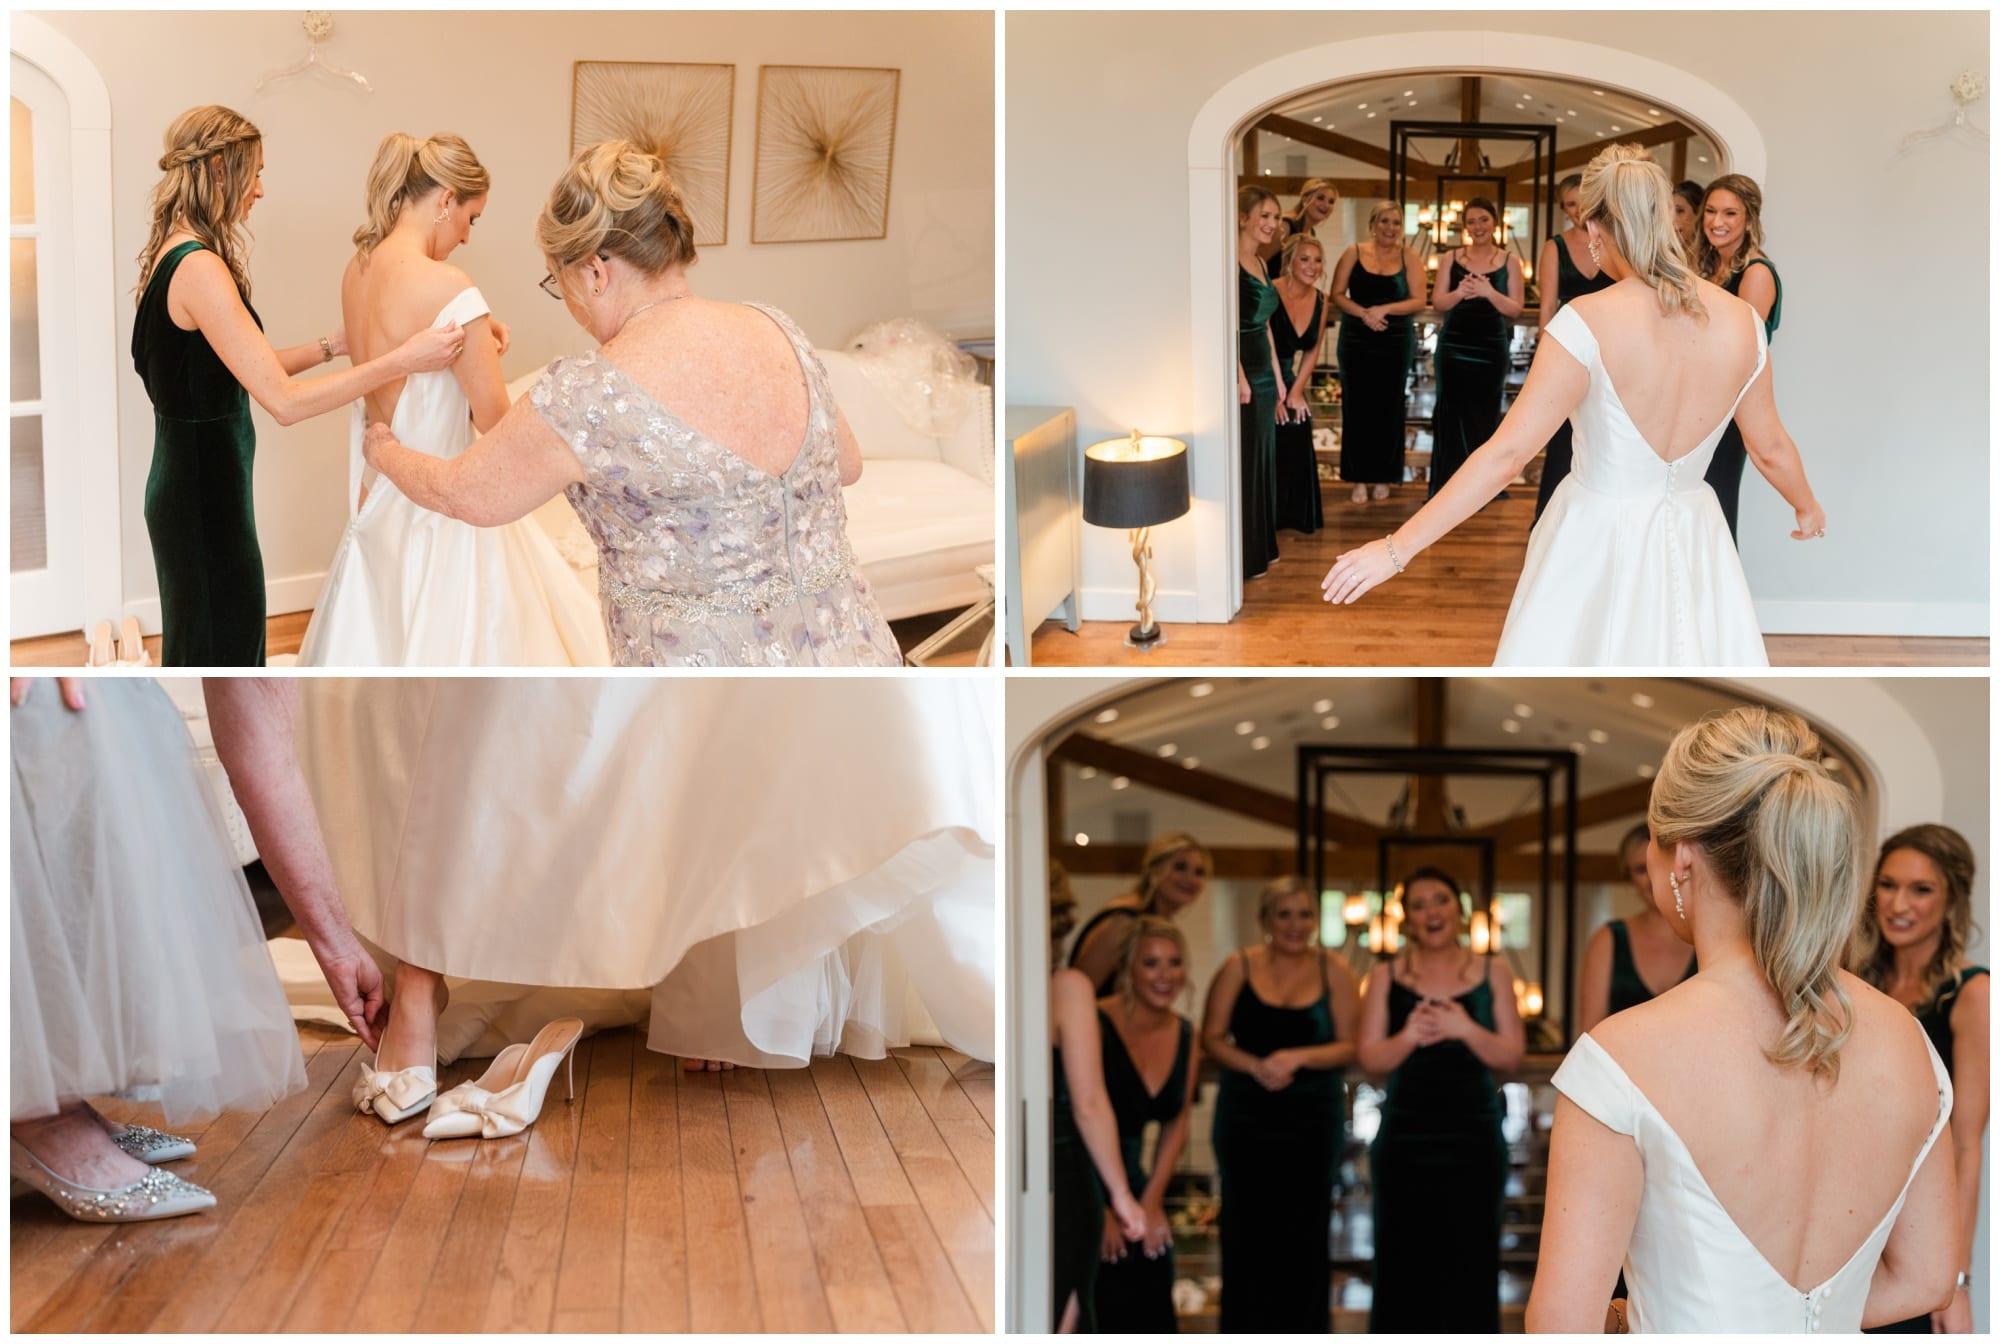 reval of dress to bridesmaids